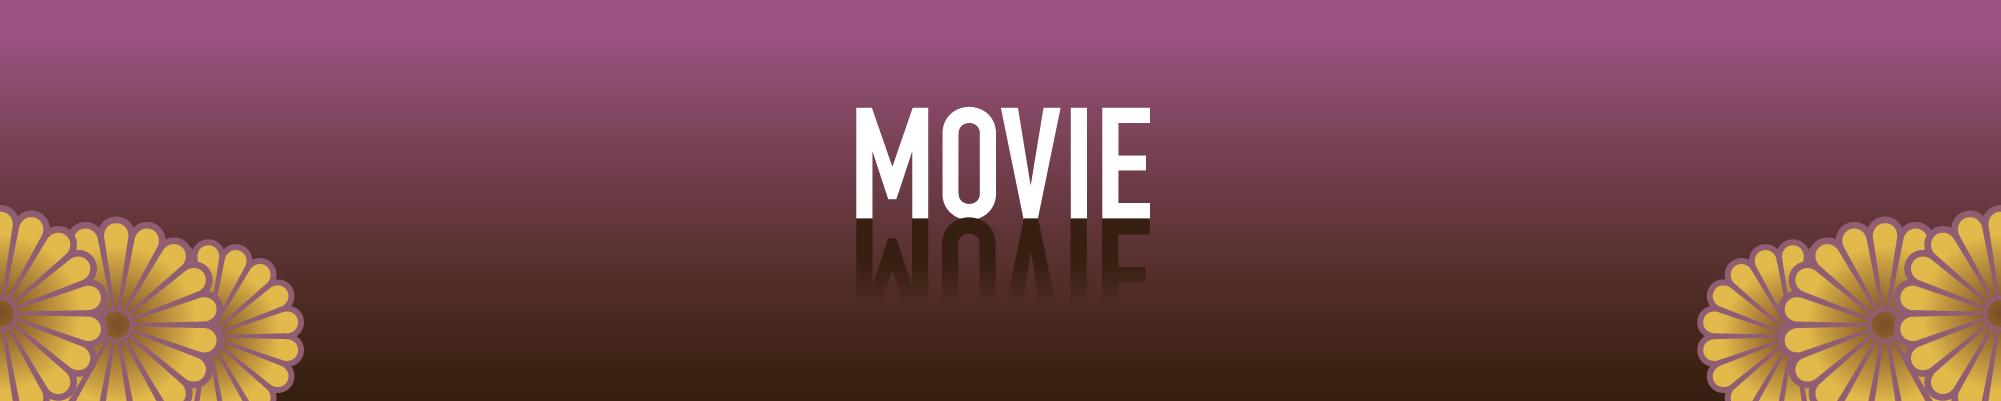 Section Title - Lunar Movie